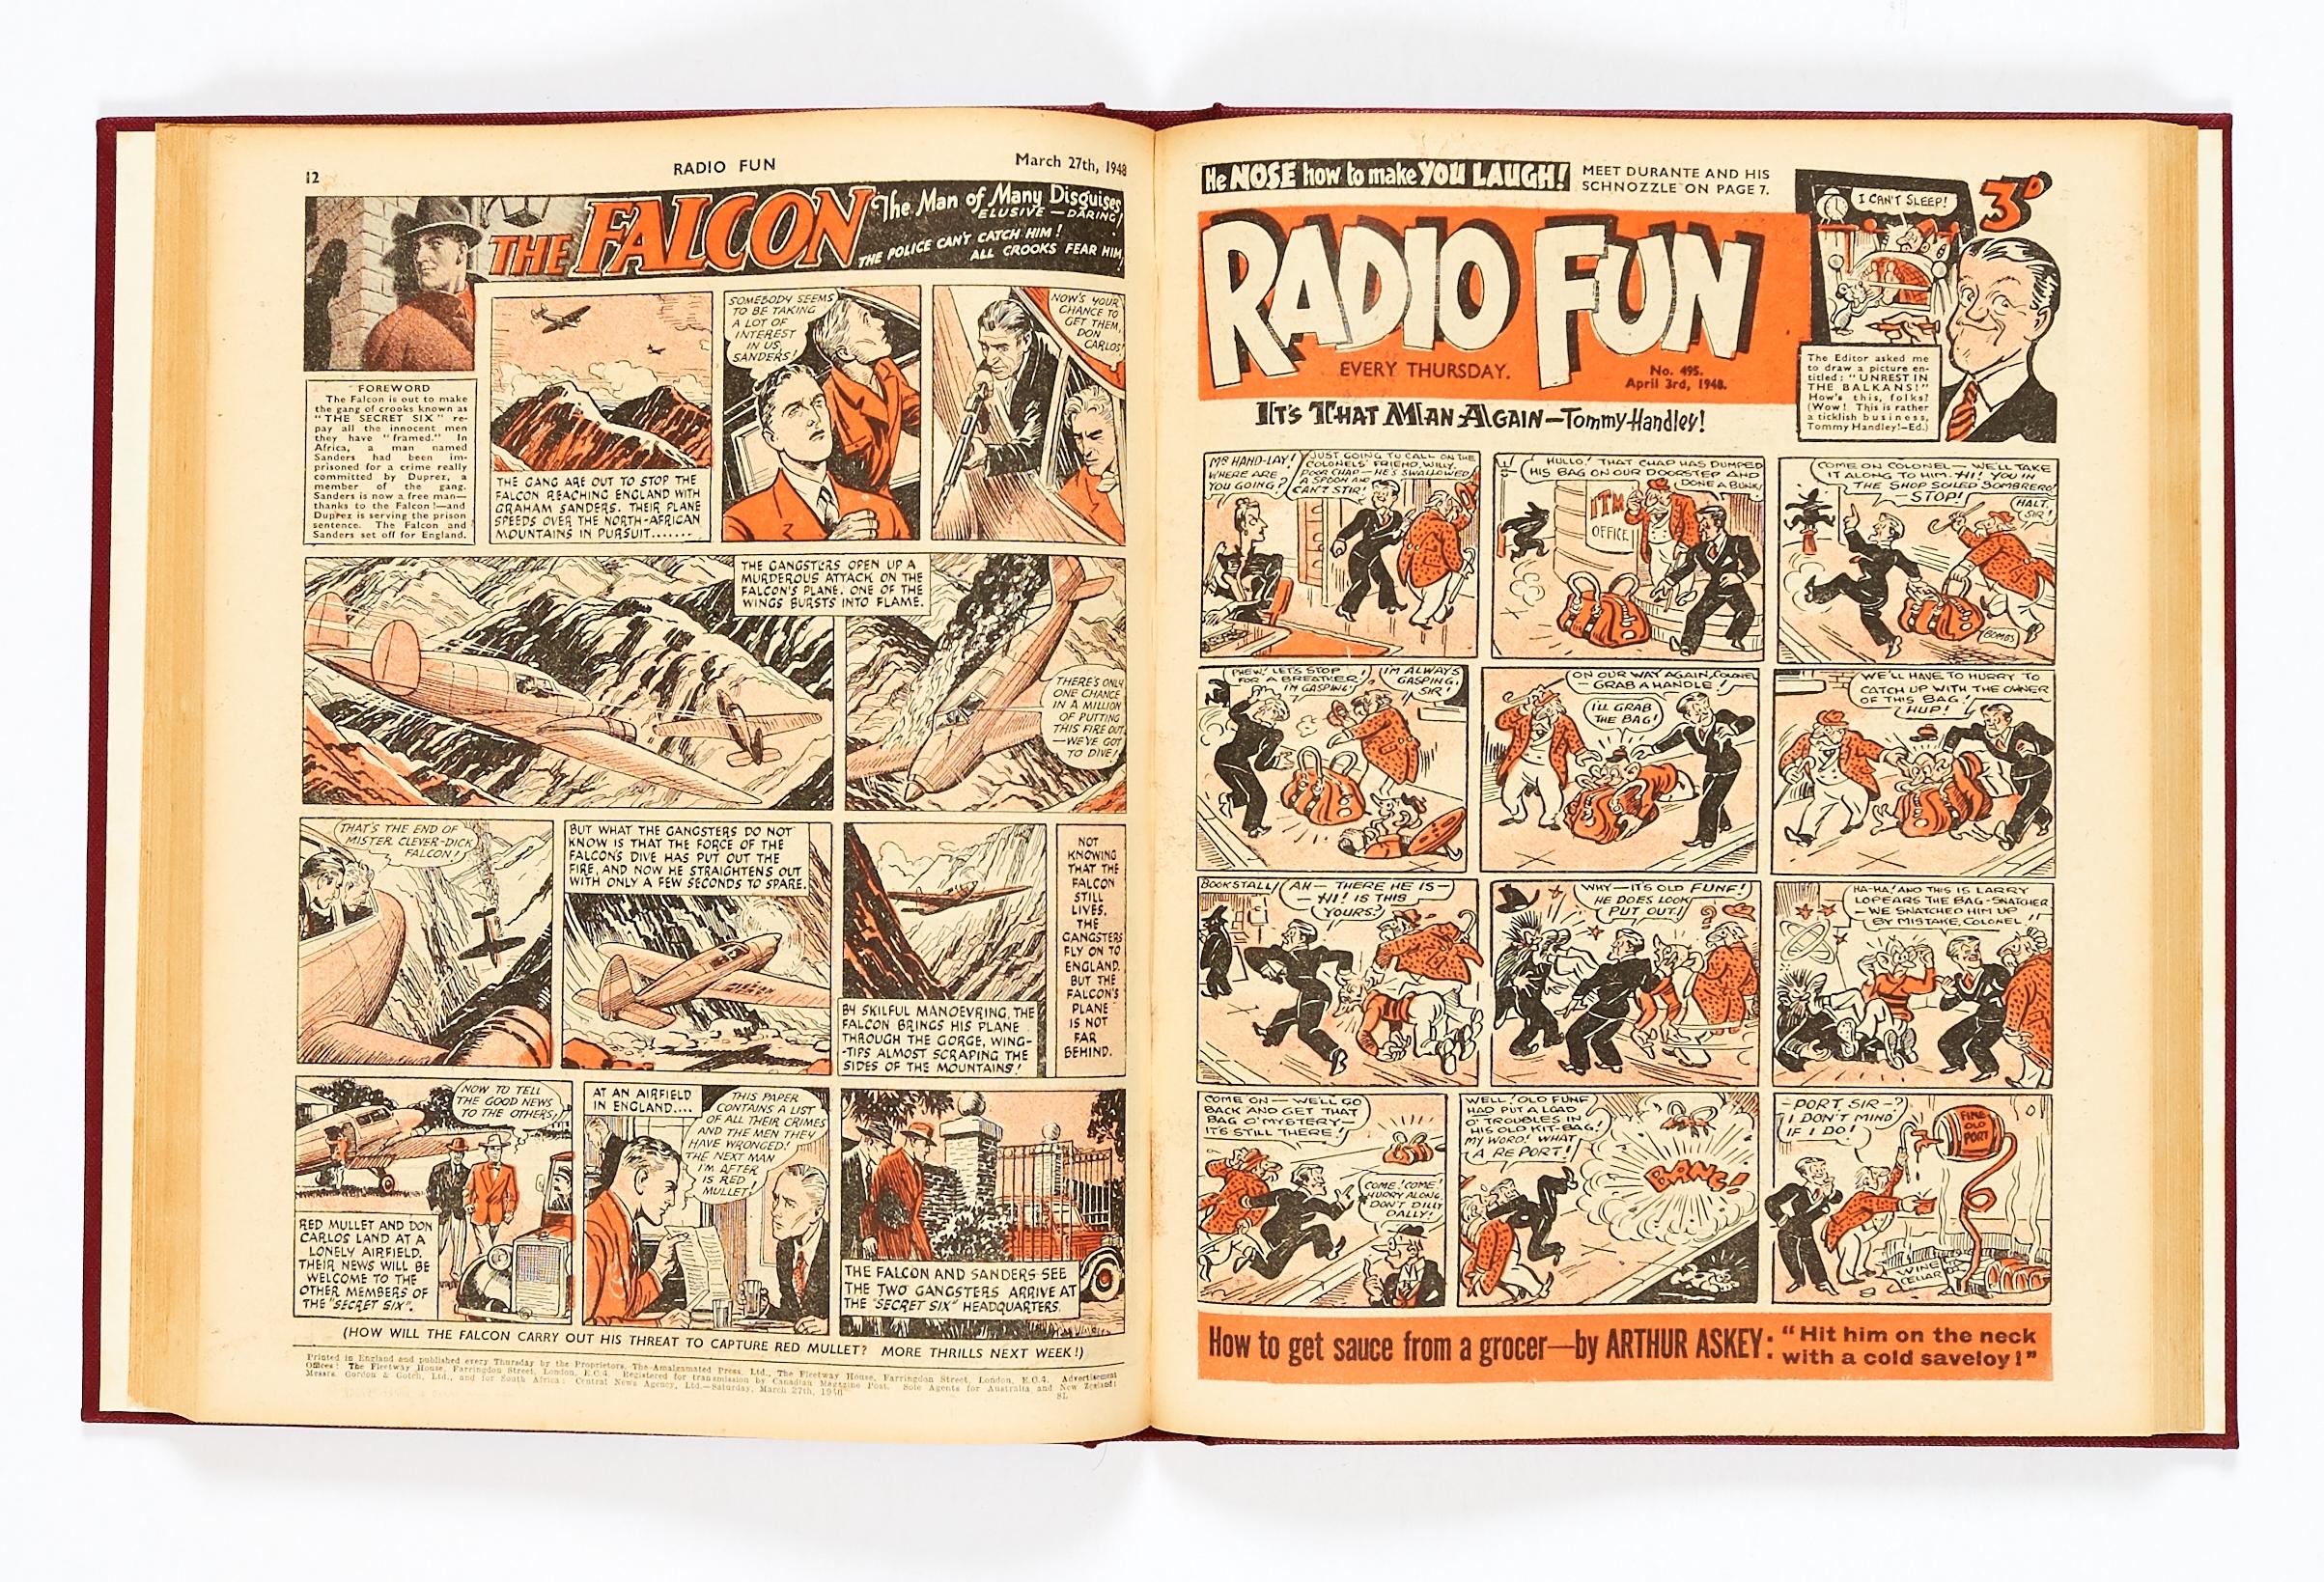 Lot 31 - Radio Fun (Jan-Jun 1948) 482-507. Publisher's file copies in half-year bound volume. Starring